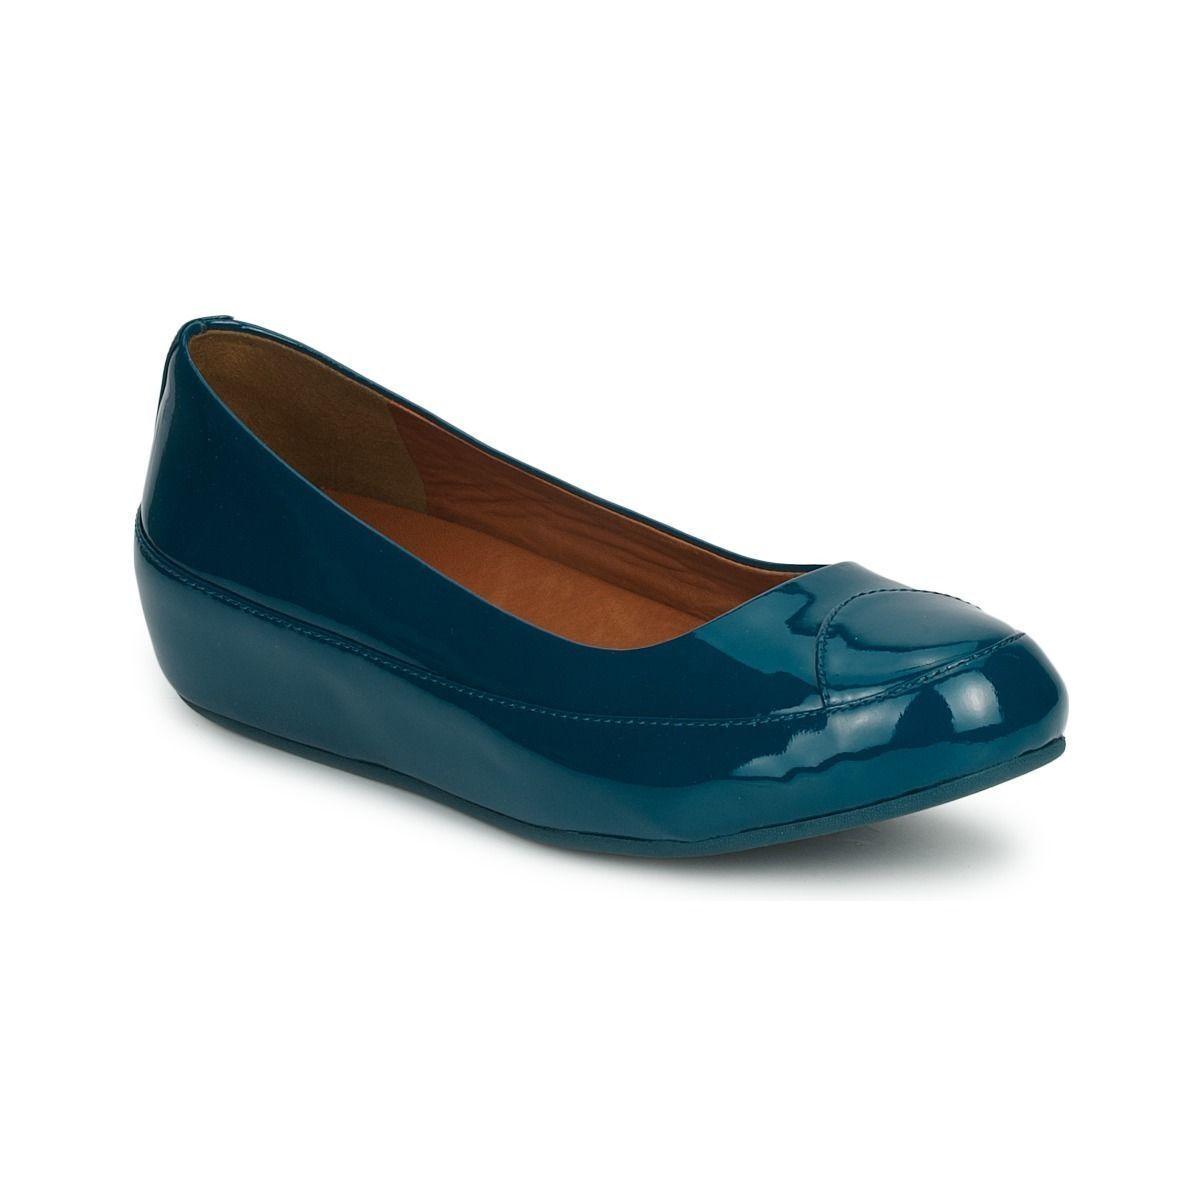 FITFLOP ™ Blu a causa delle immersioni Blu ™ Cuoio Ballerina Pompe Scarpe EU 36 RRP 4a9cee